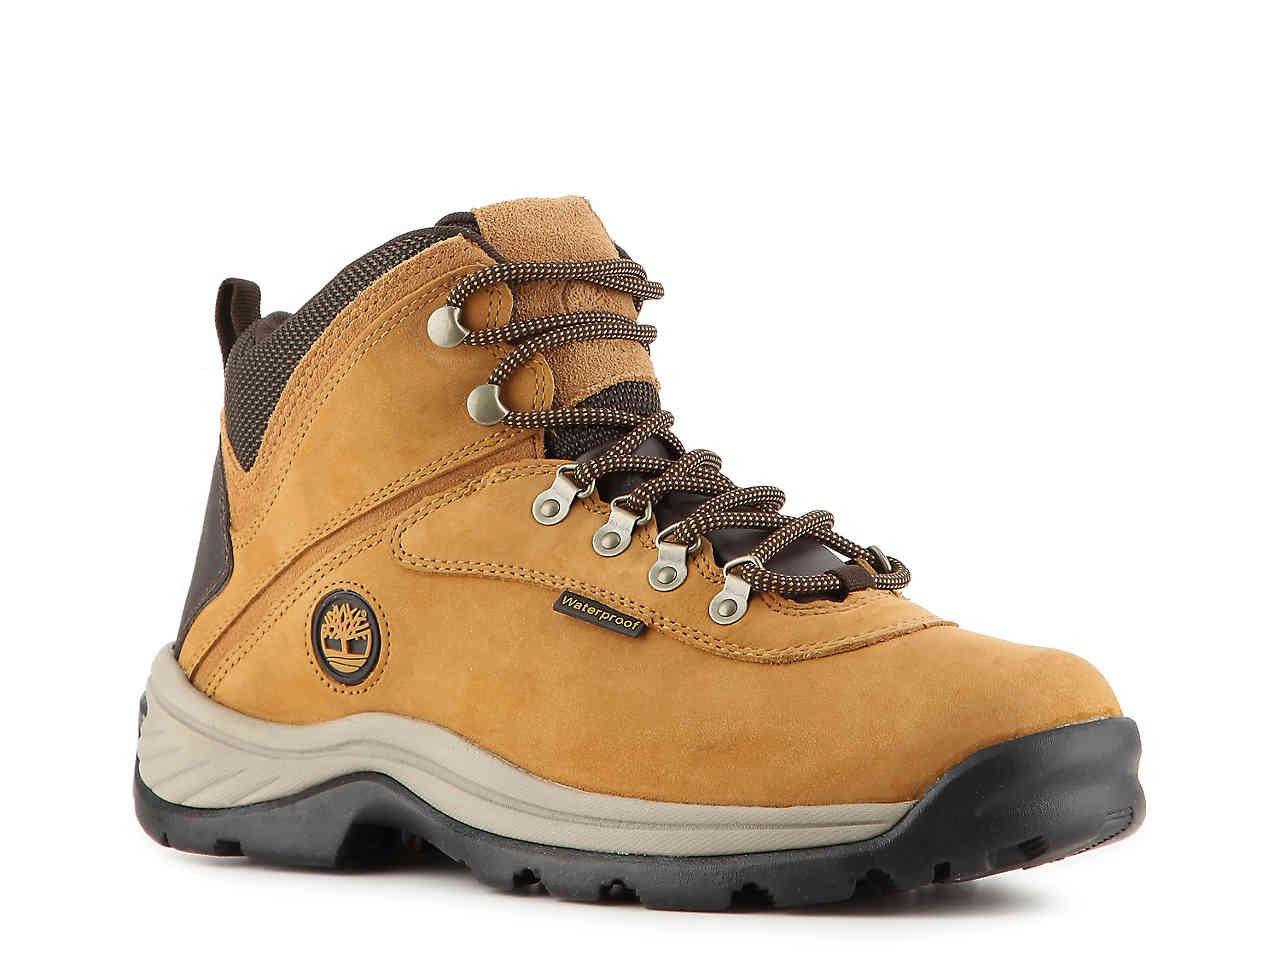 Timberland Men's White Ledge Mid Waterproof Boots, Wheat, 10W